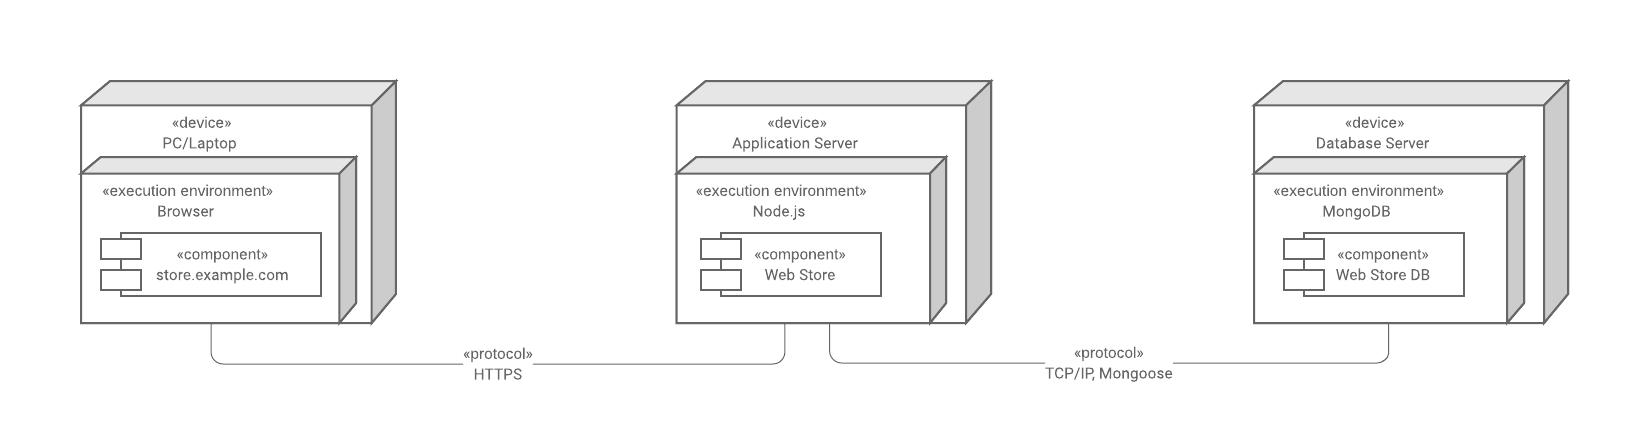 higher-level UML deployment diagram